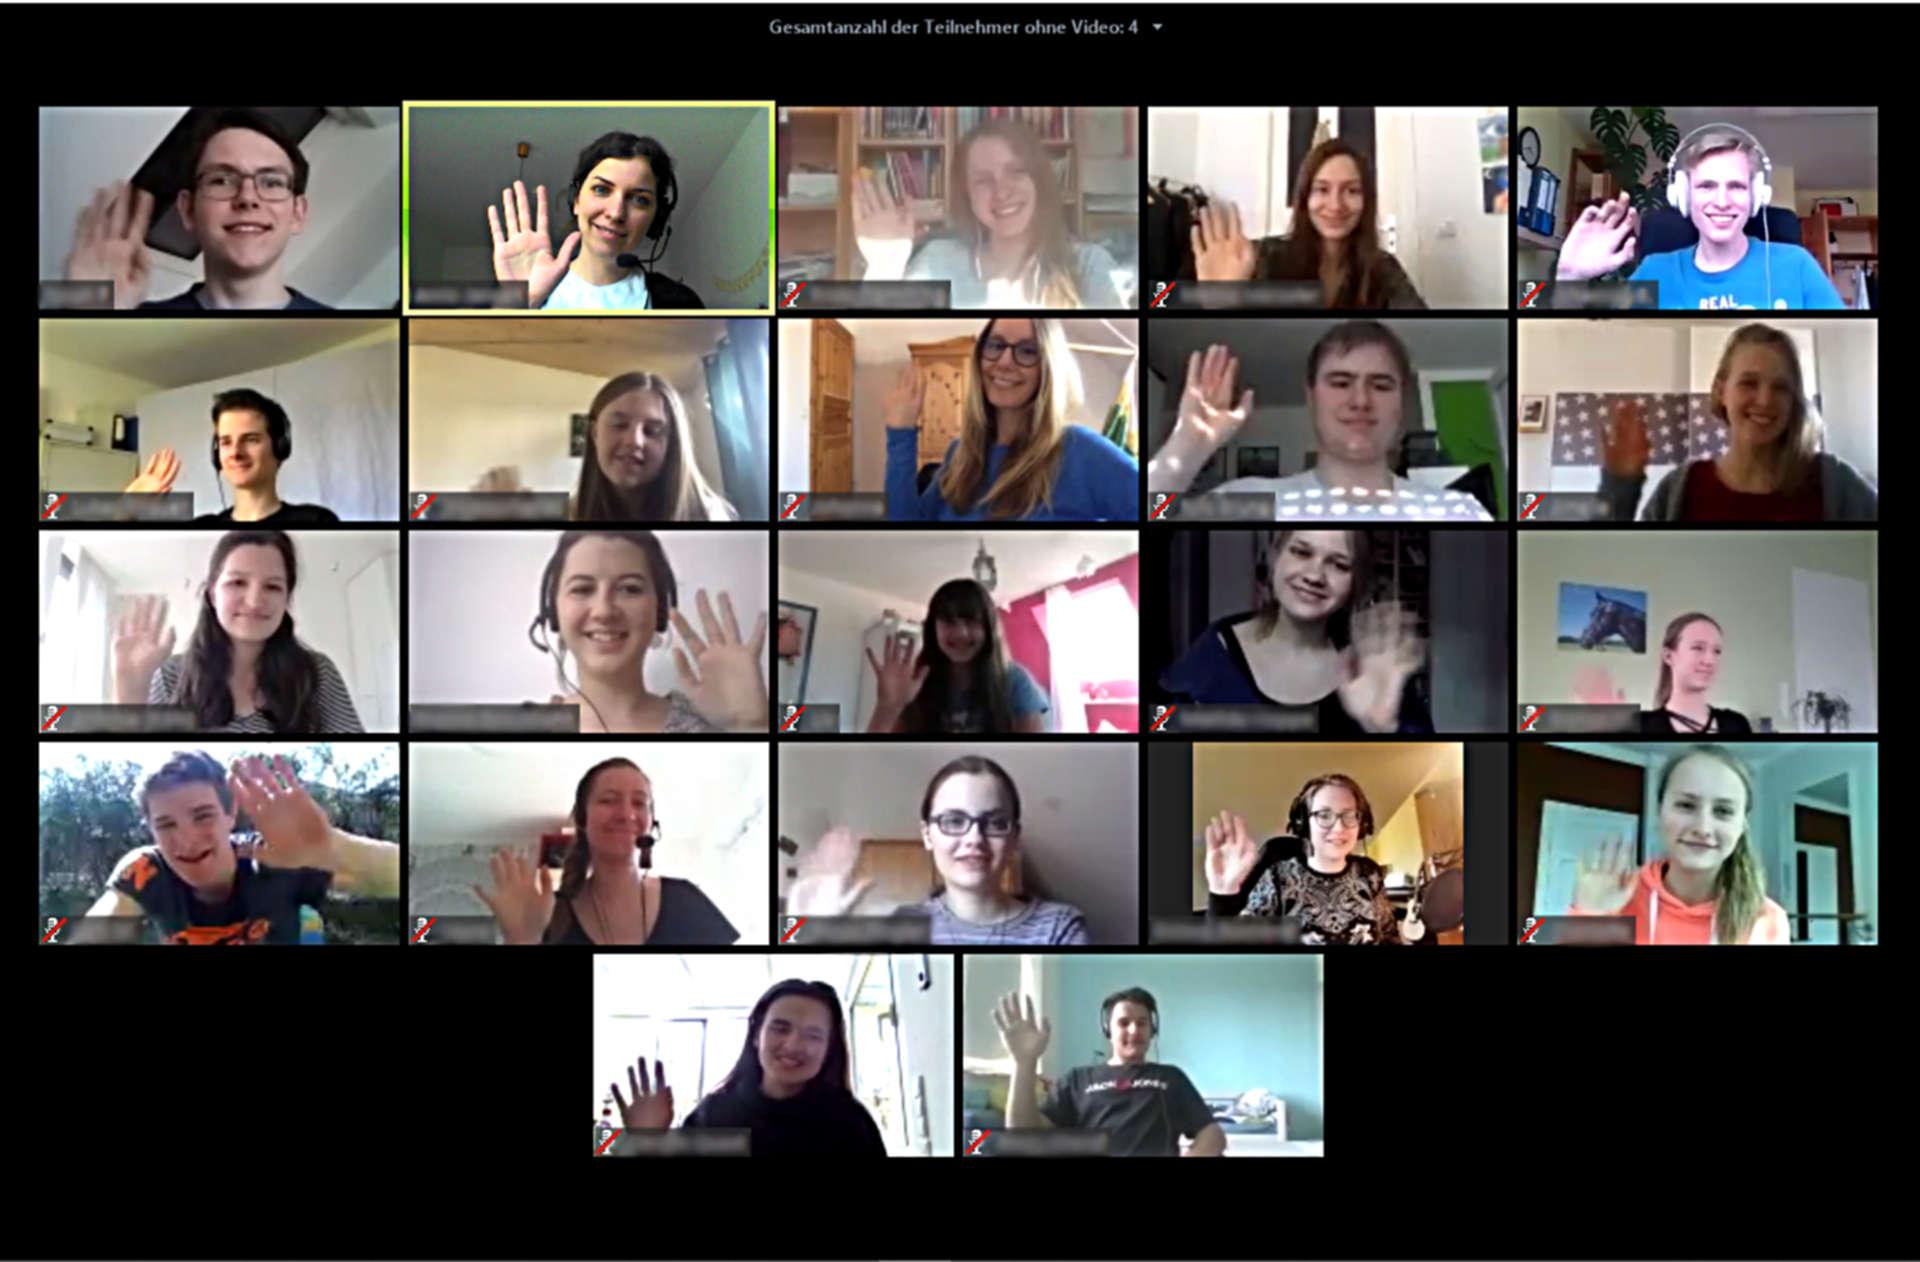 2° Campus Teilnehmer